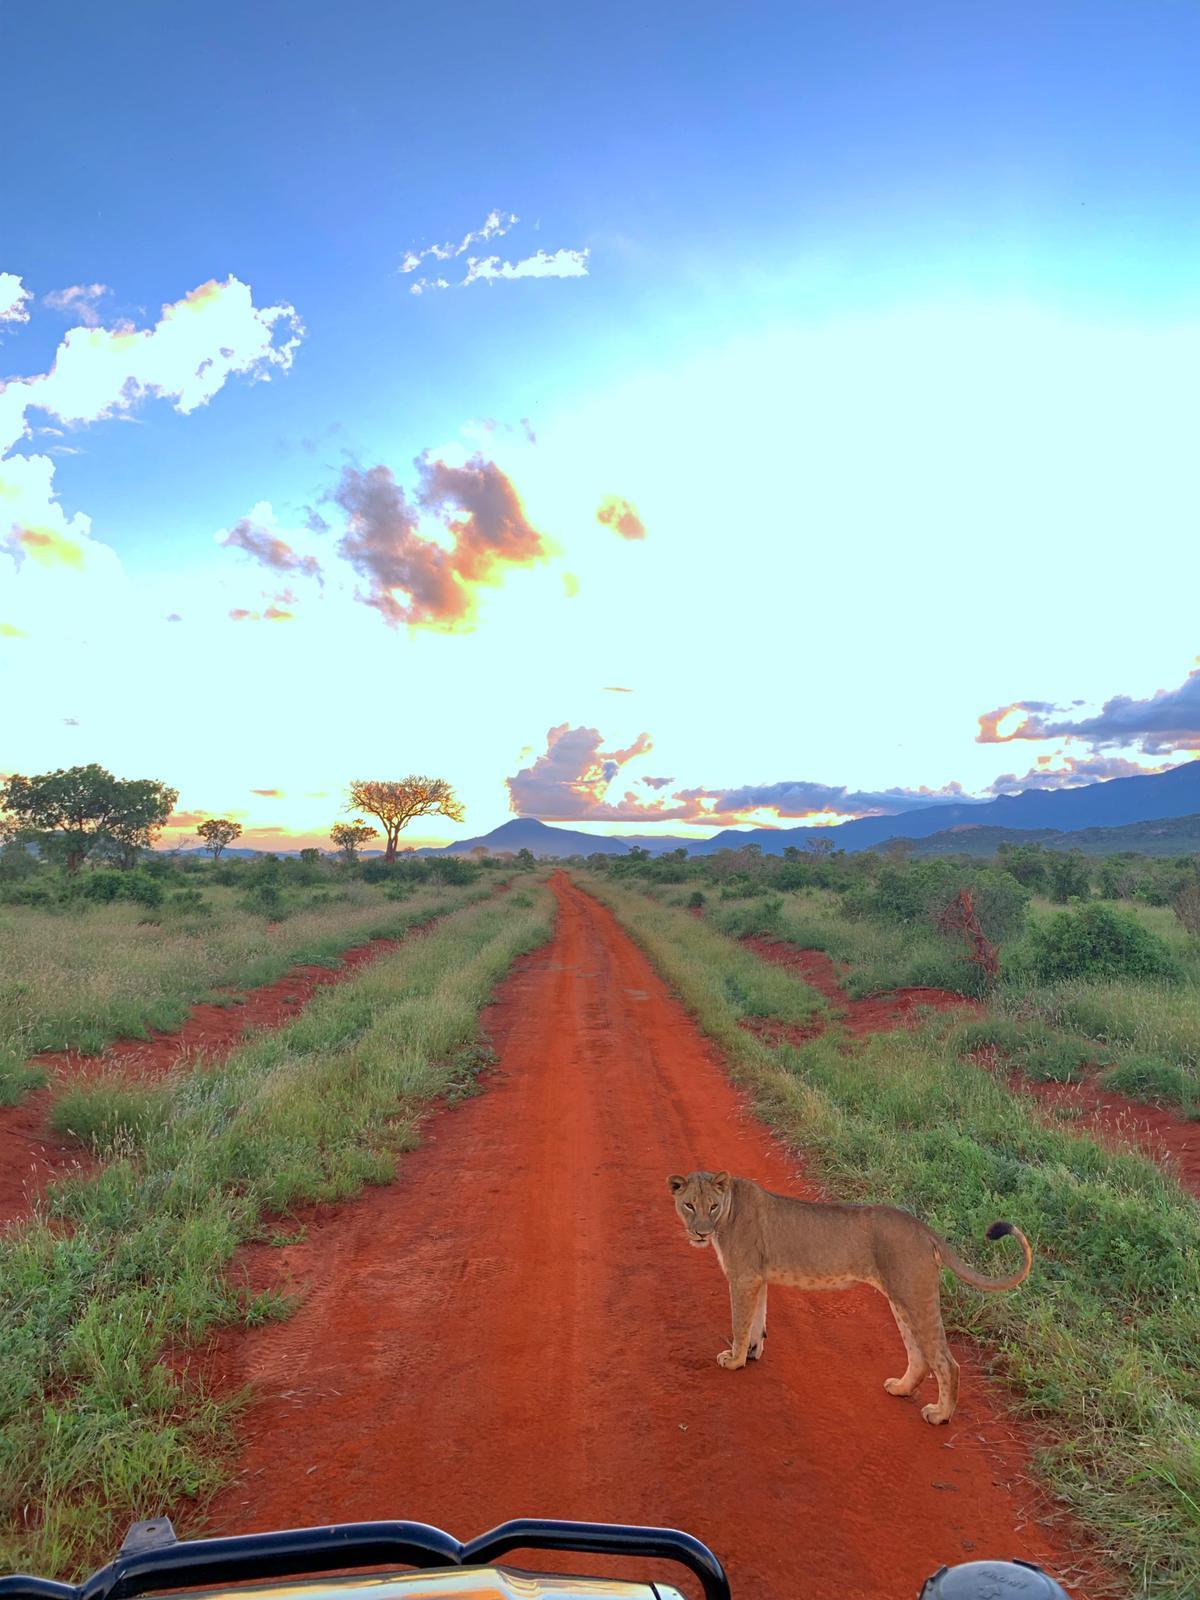 WhatsApp Image 2019 12 16 at 13.45.311 - Samburu Simba Lodge